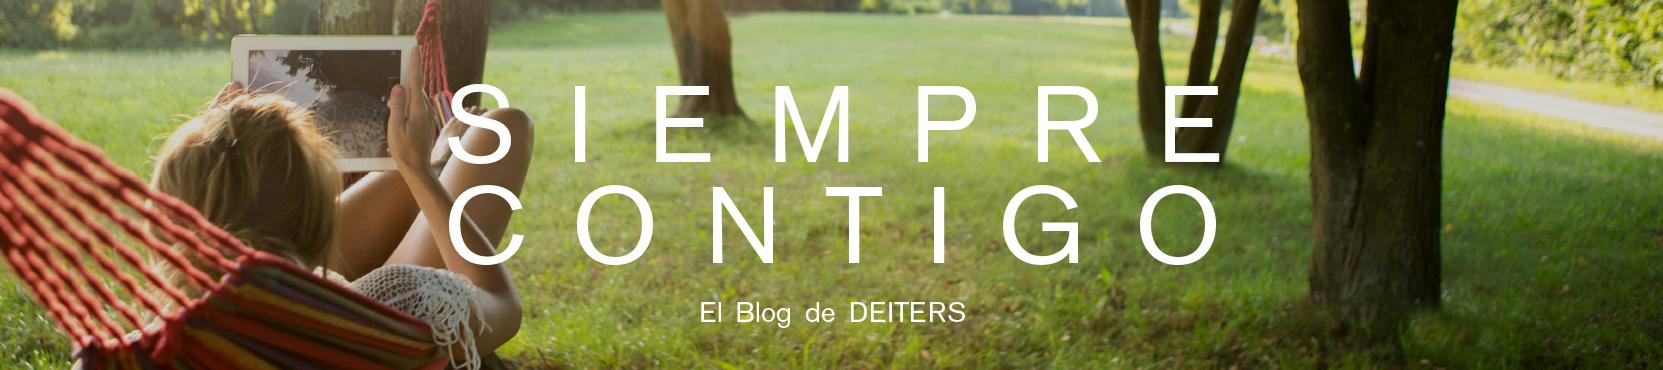 Blog Deiters Siempre Contigo